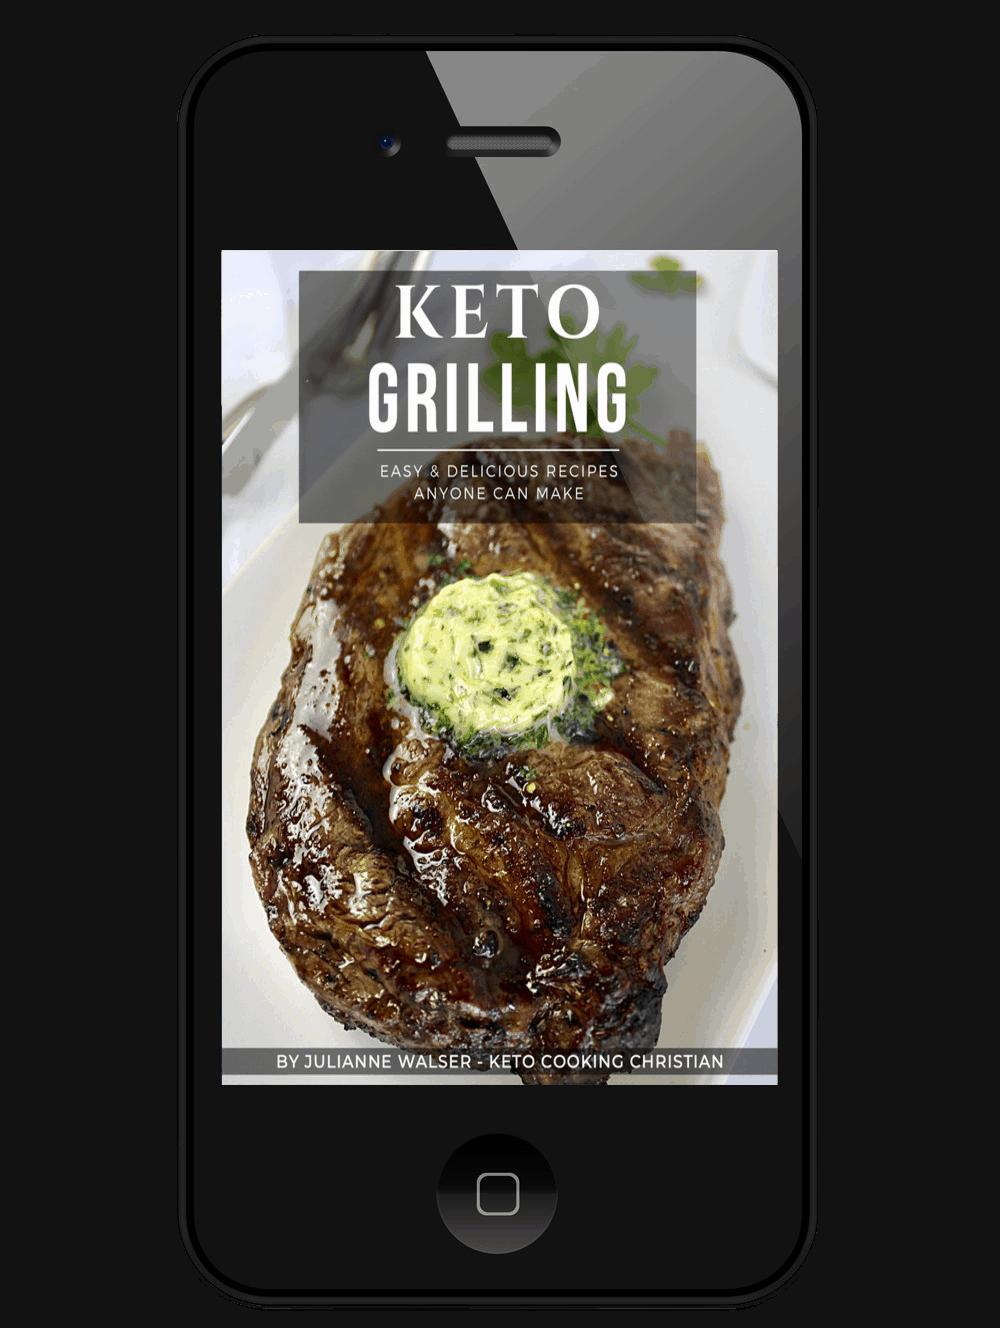 Keto Grilling eBook on mobile